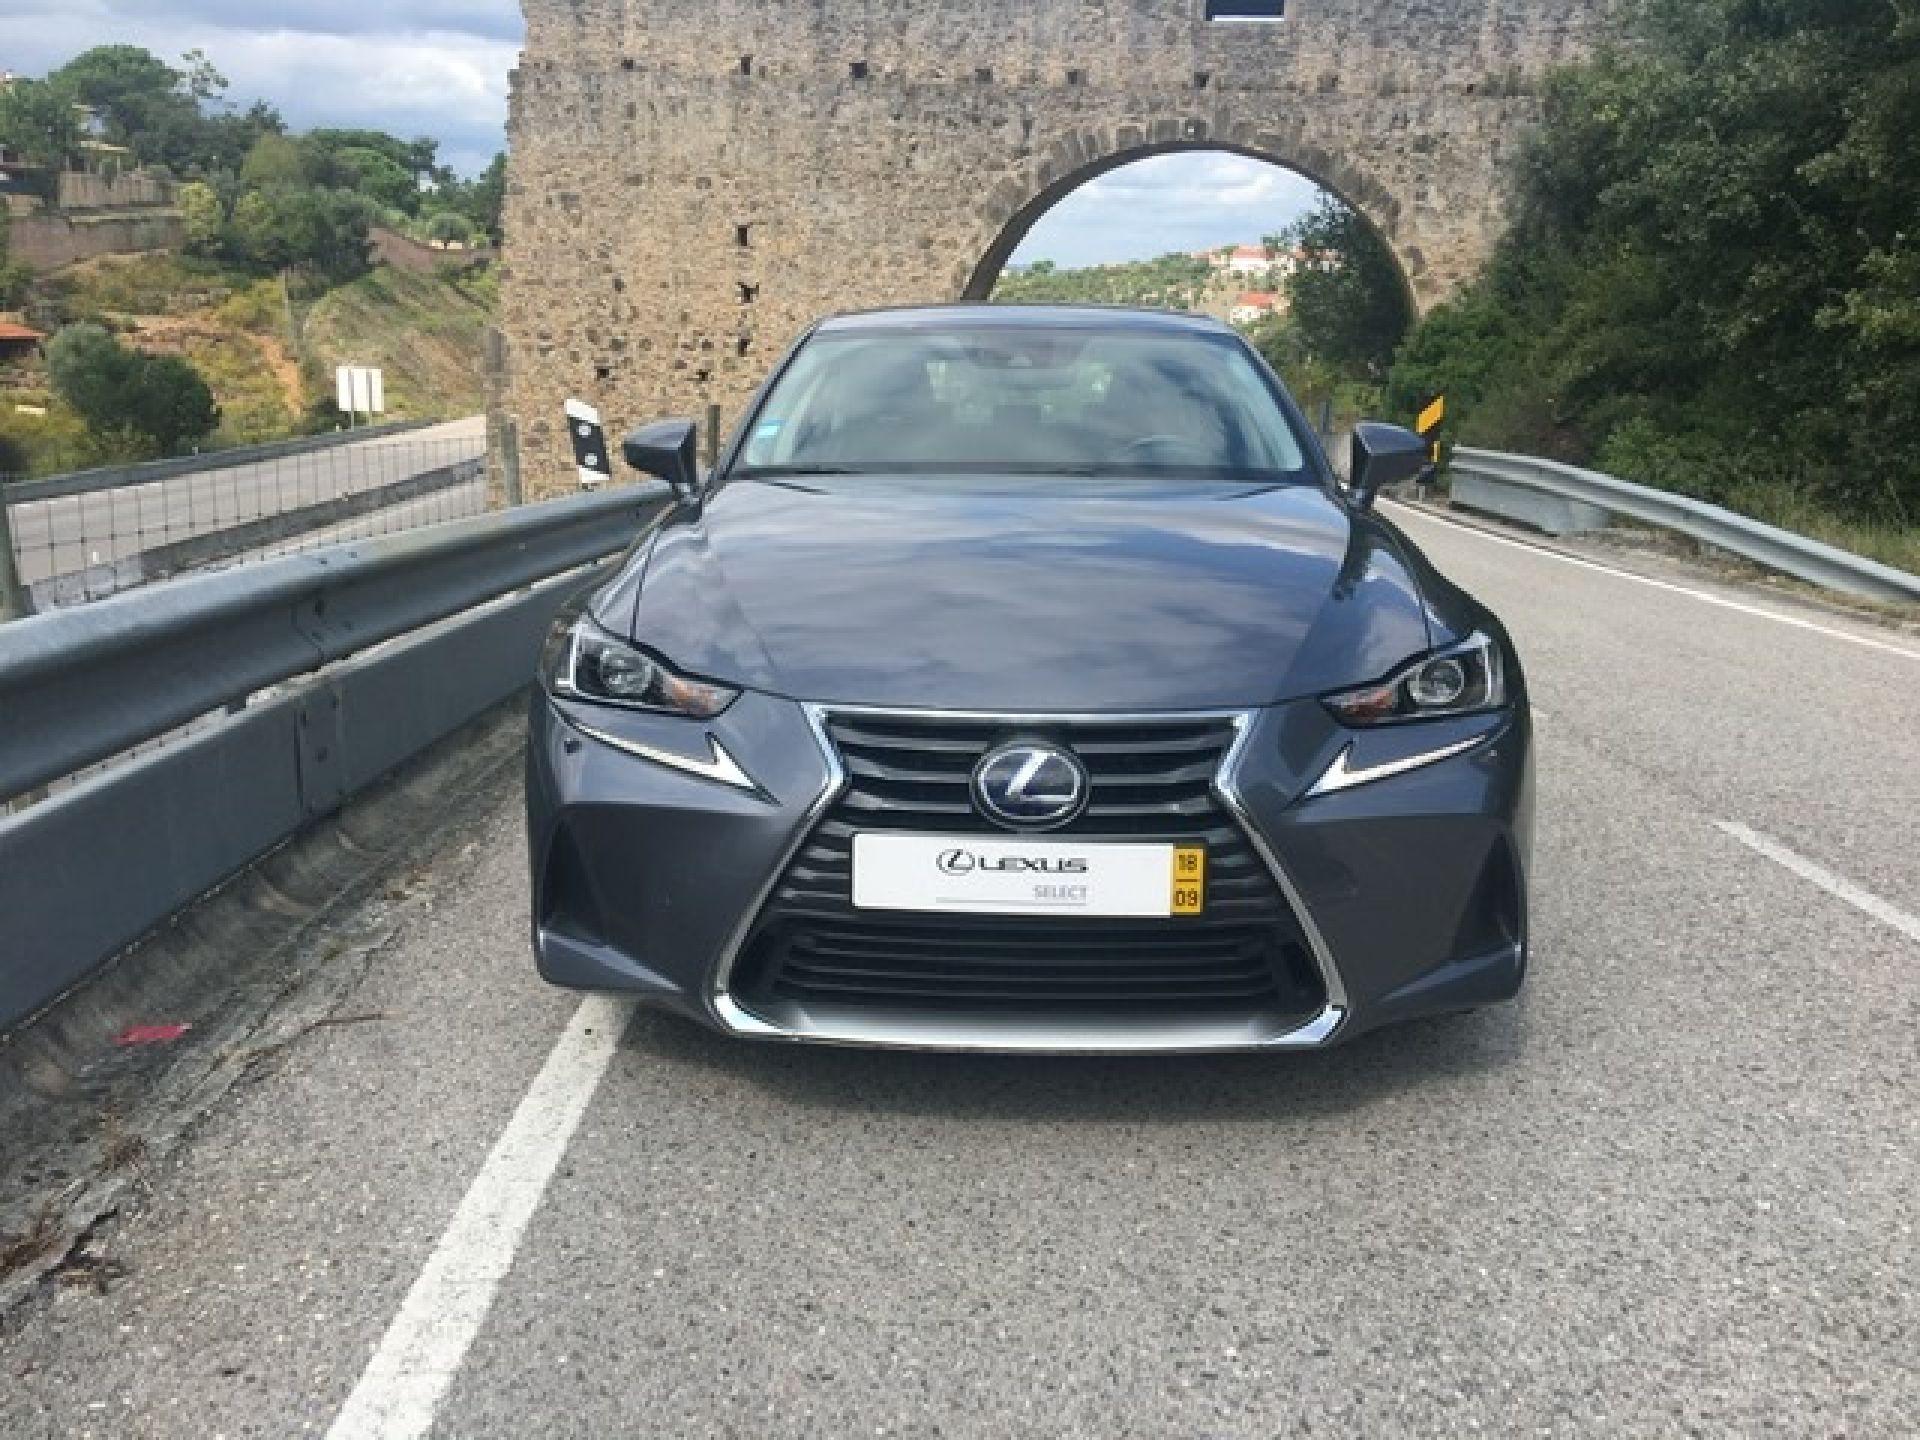 Lexus IS 300h Executive Plus usada Coimbra